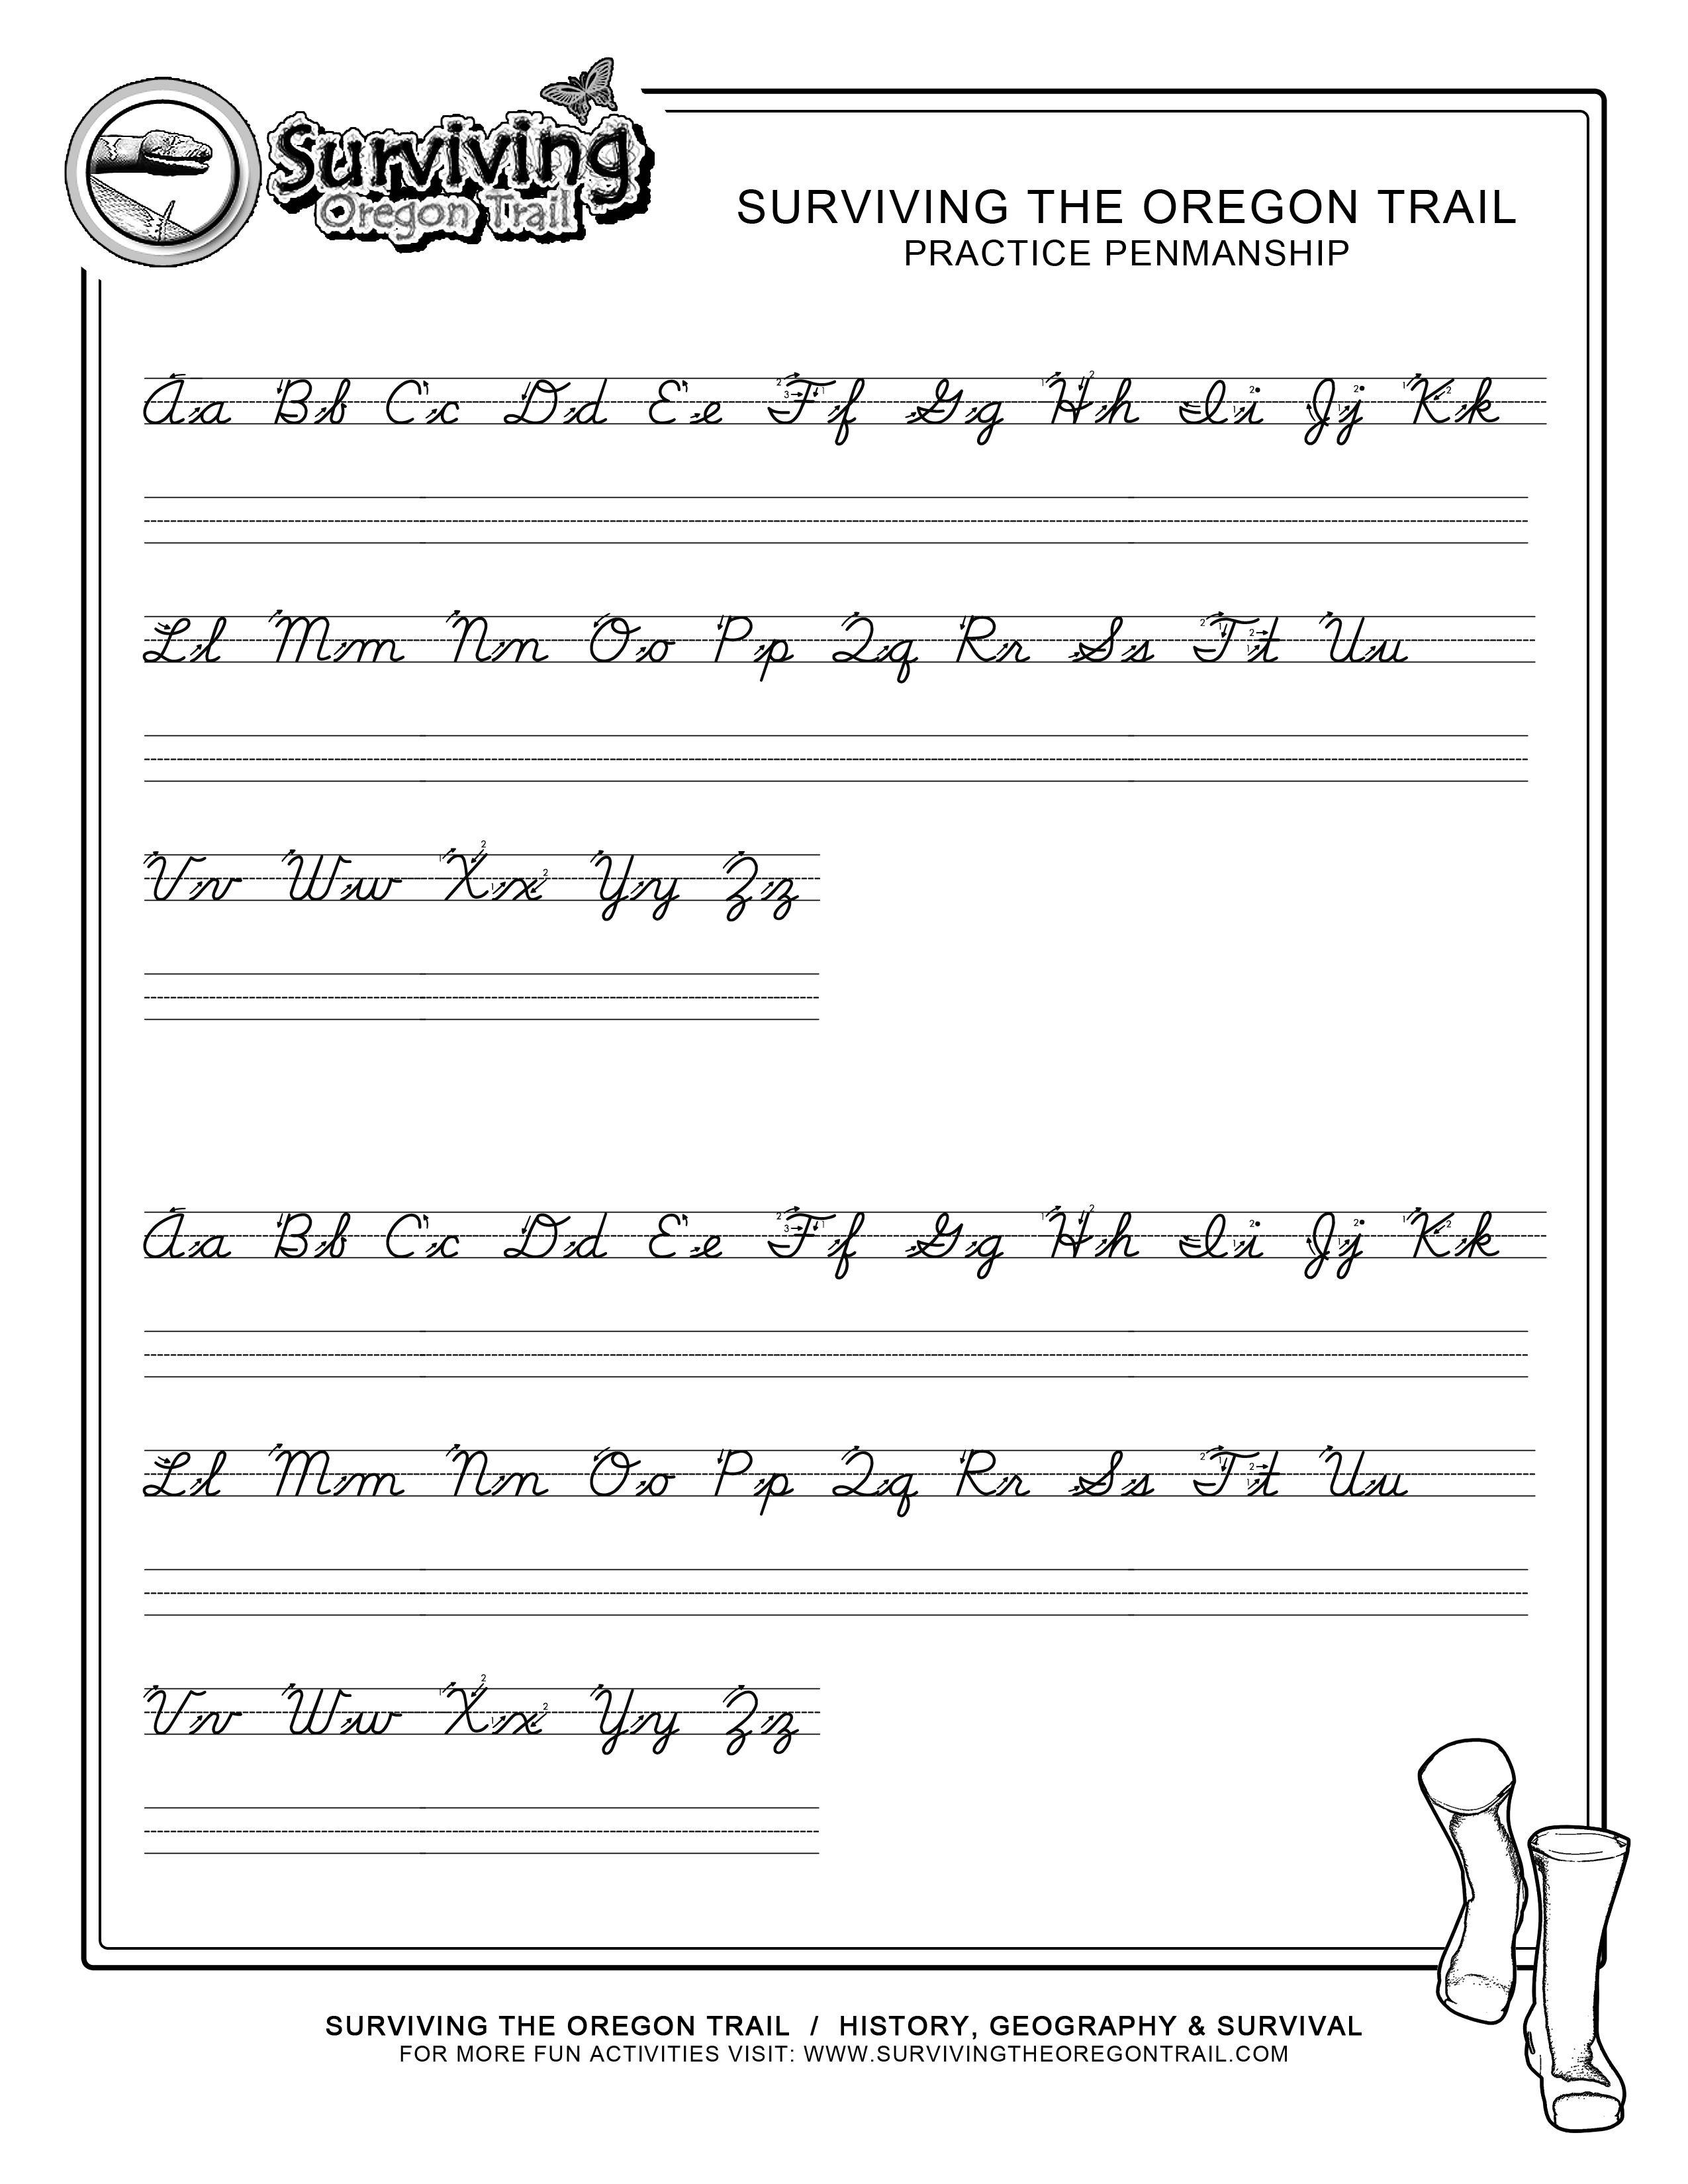 Practice Penmanship – Free Abc's Printable Cursive Writing Worksheet - Free Printable Cursive Writing Paragraphs